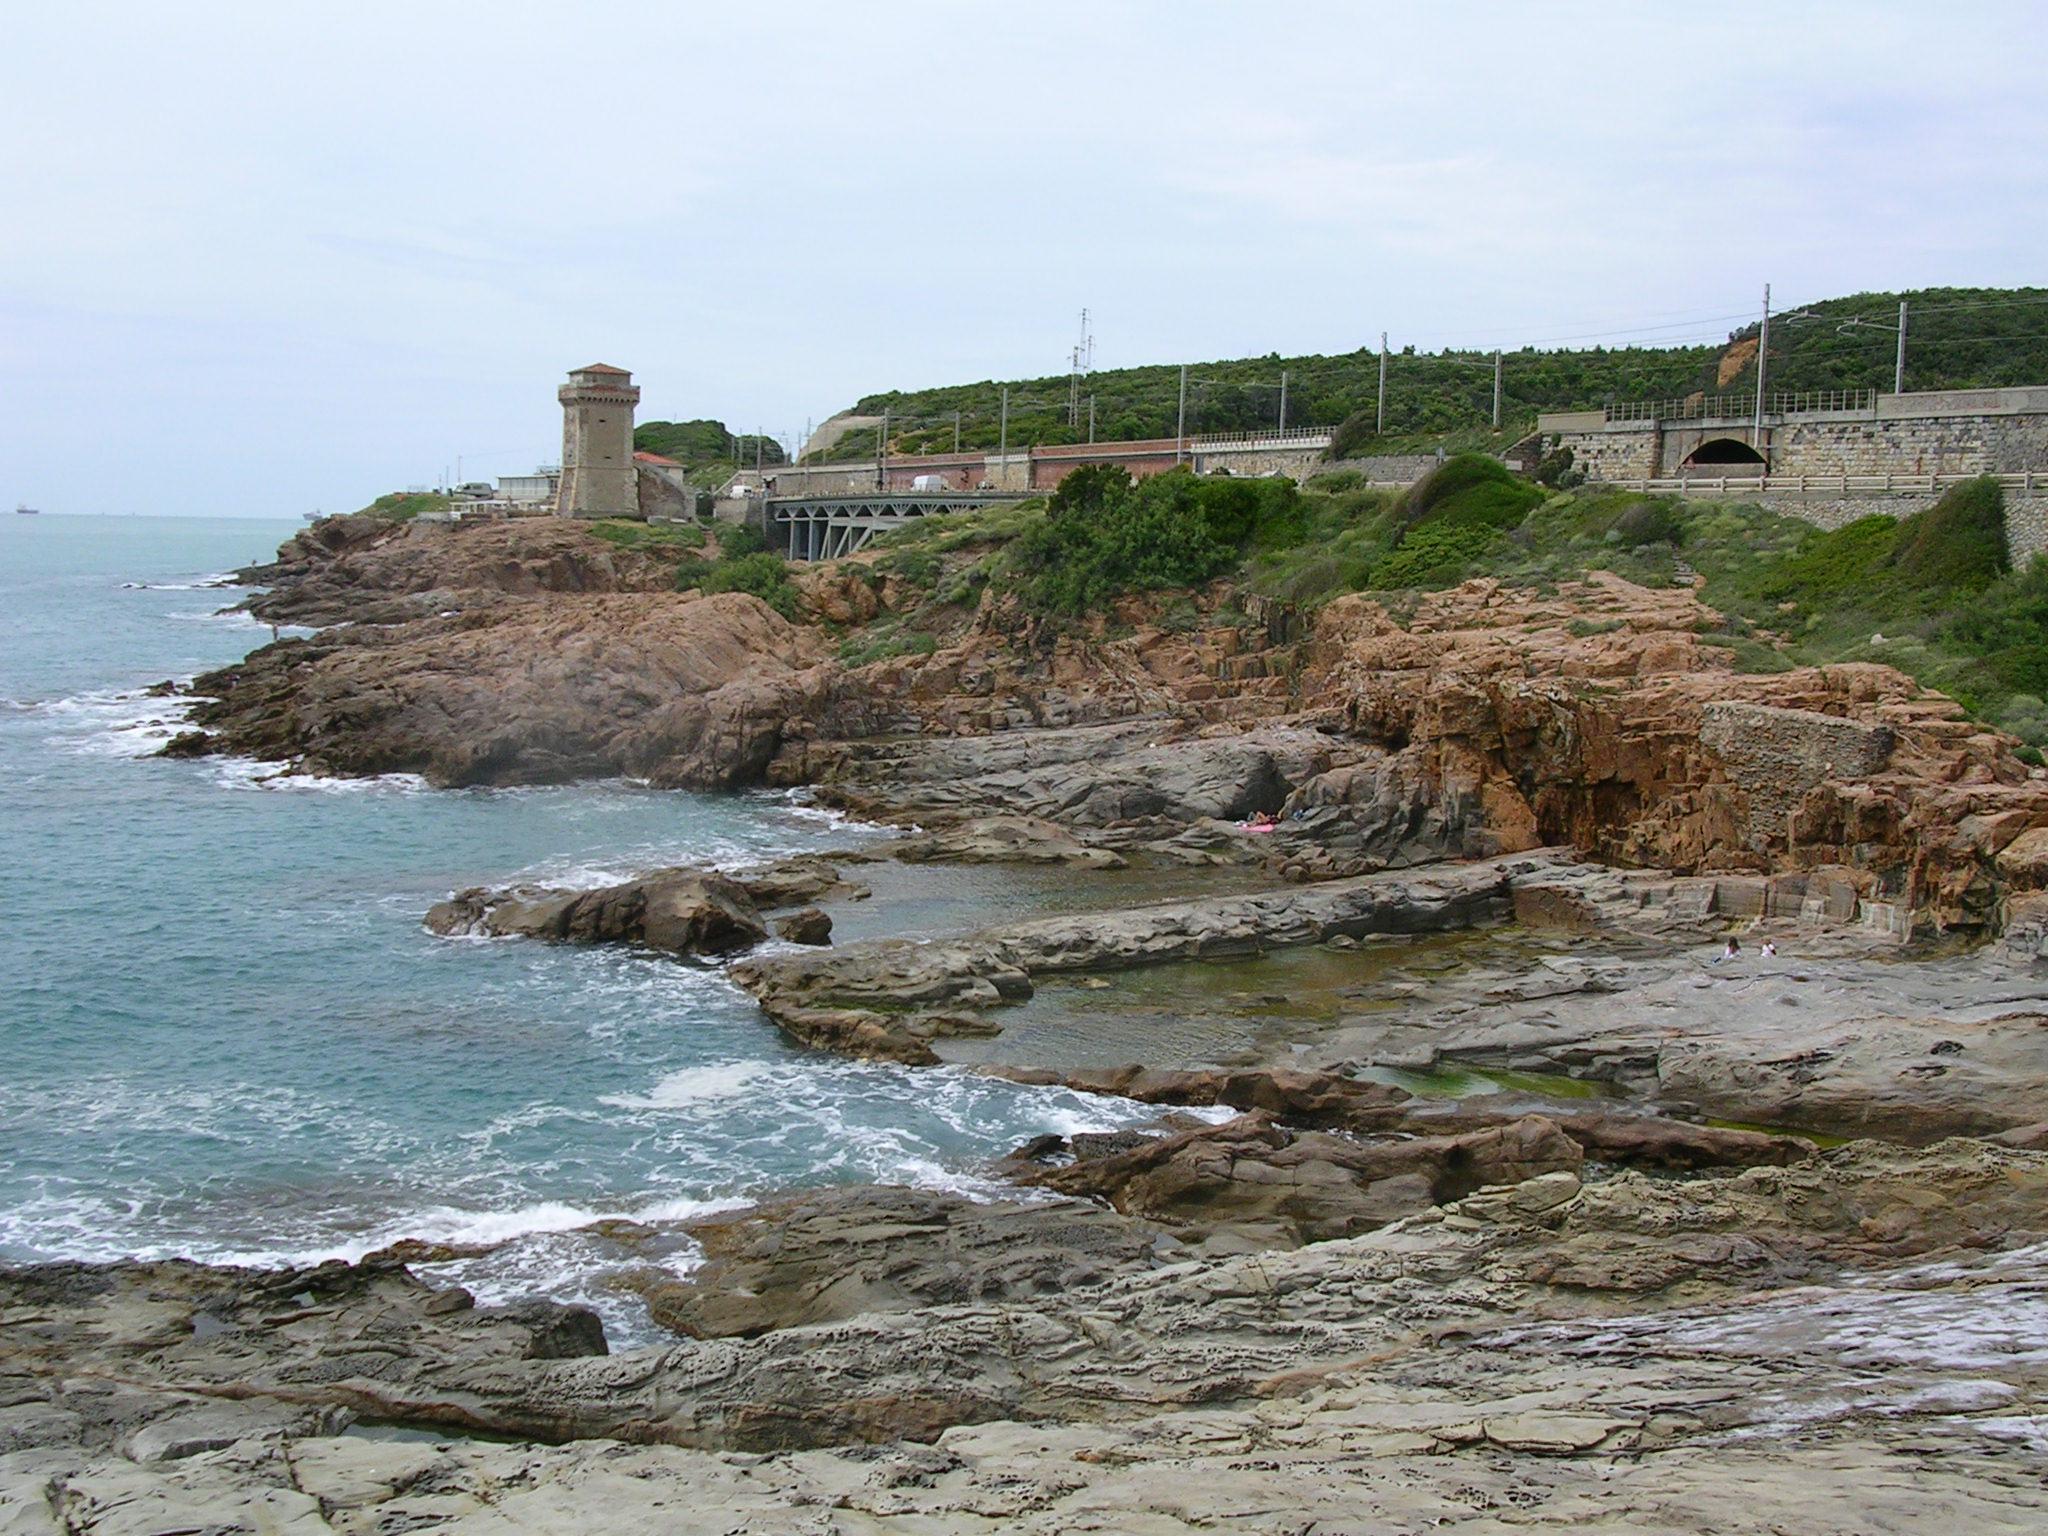 Matrimonio Spiaggia Livorno : Spiagge toscana nessunapretesa